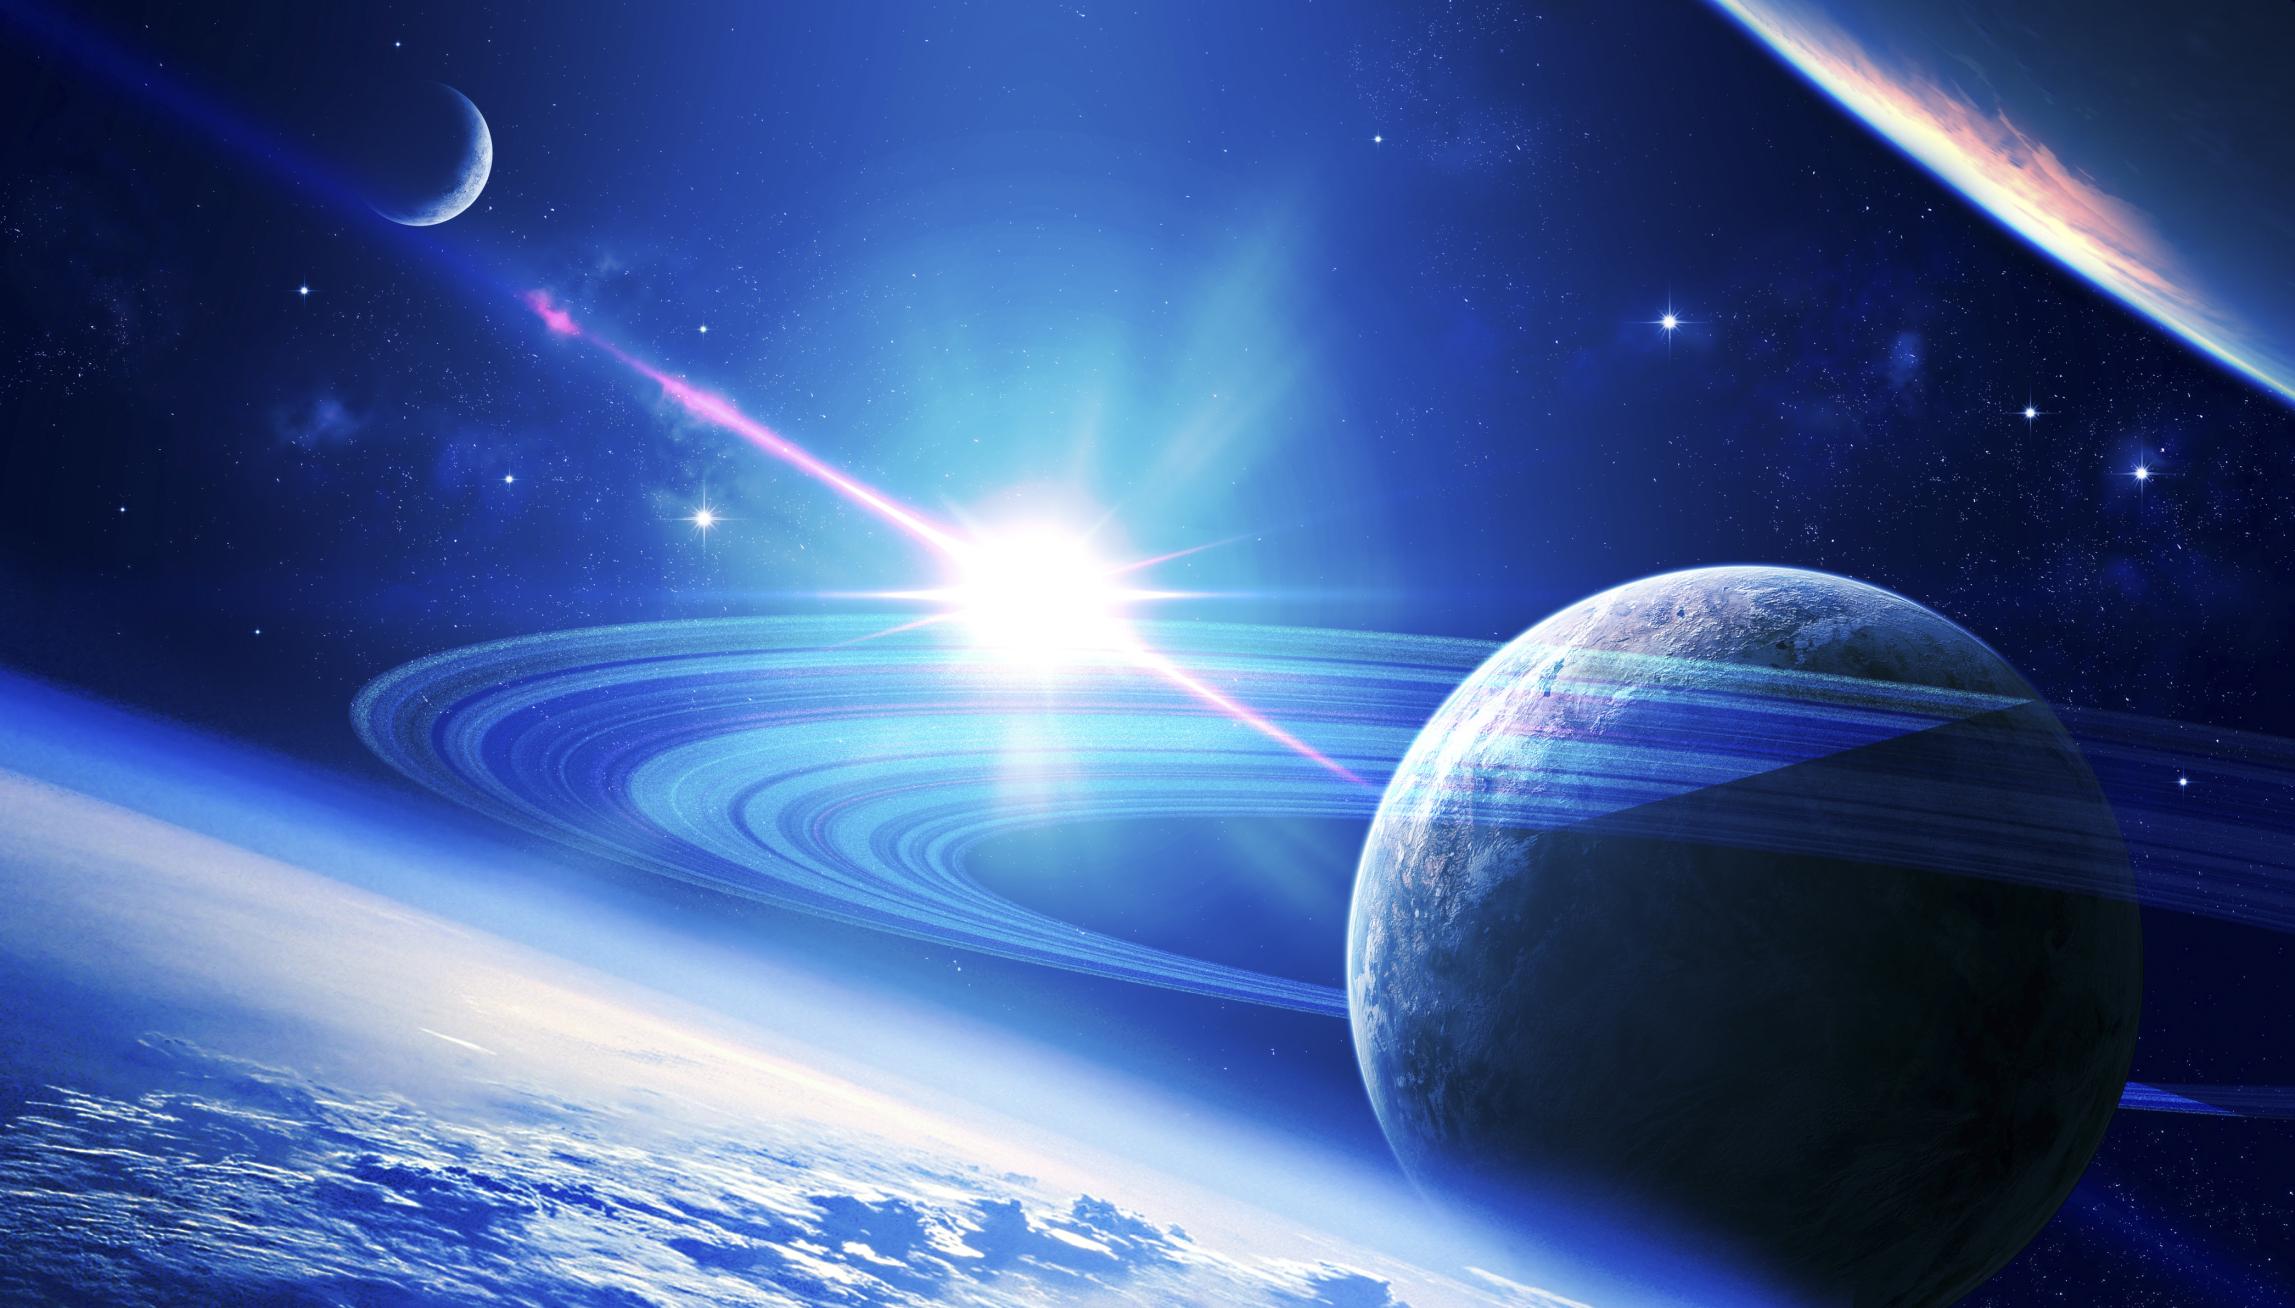 Planetele care pot sustine viata extraterestra. Cat trebuie sa fie de mare o planeta pentru a fi locuibila